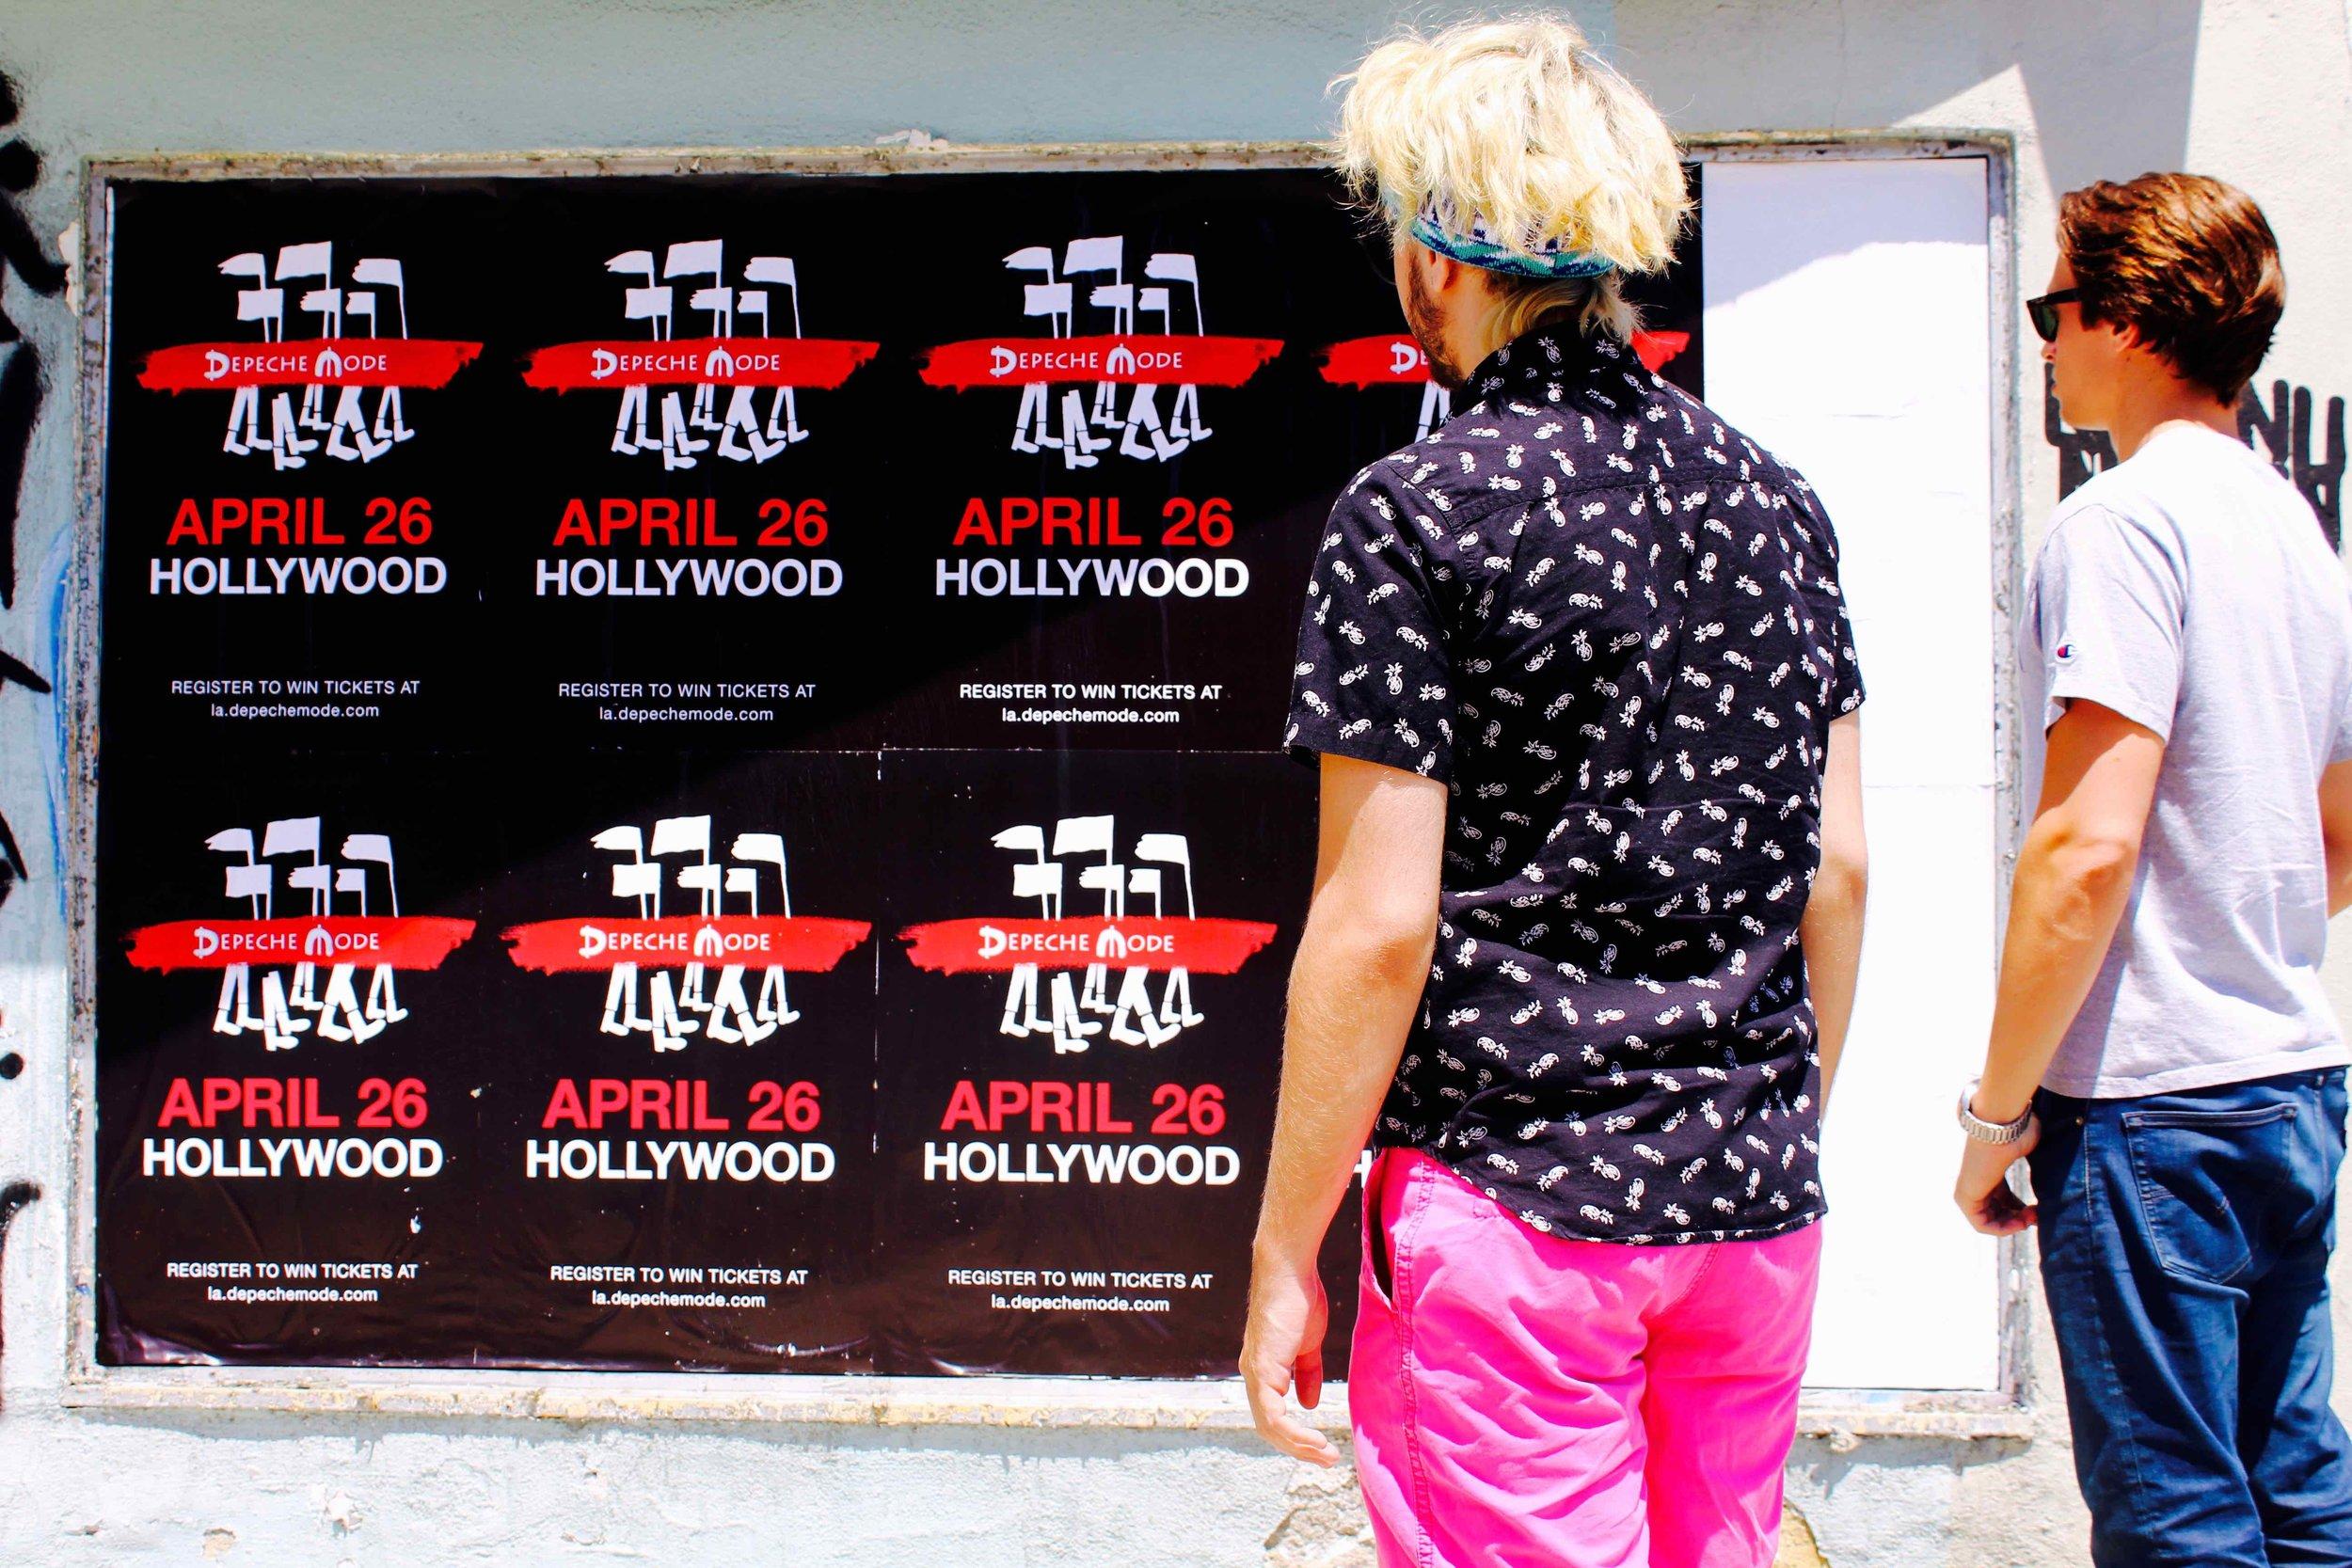 OMG | Guerilla Marketing | Wild Posting | Depeche Mode | Los Angeles